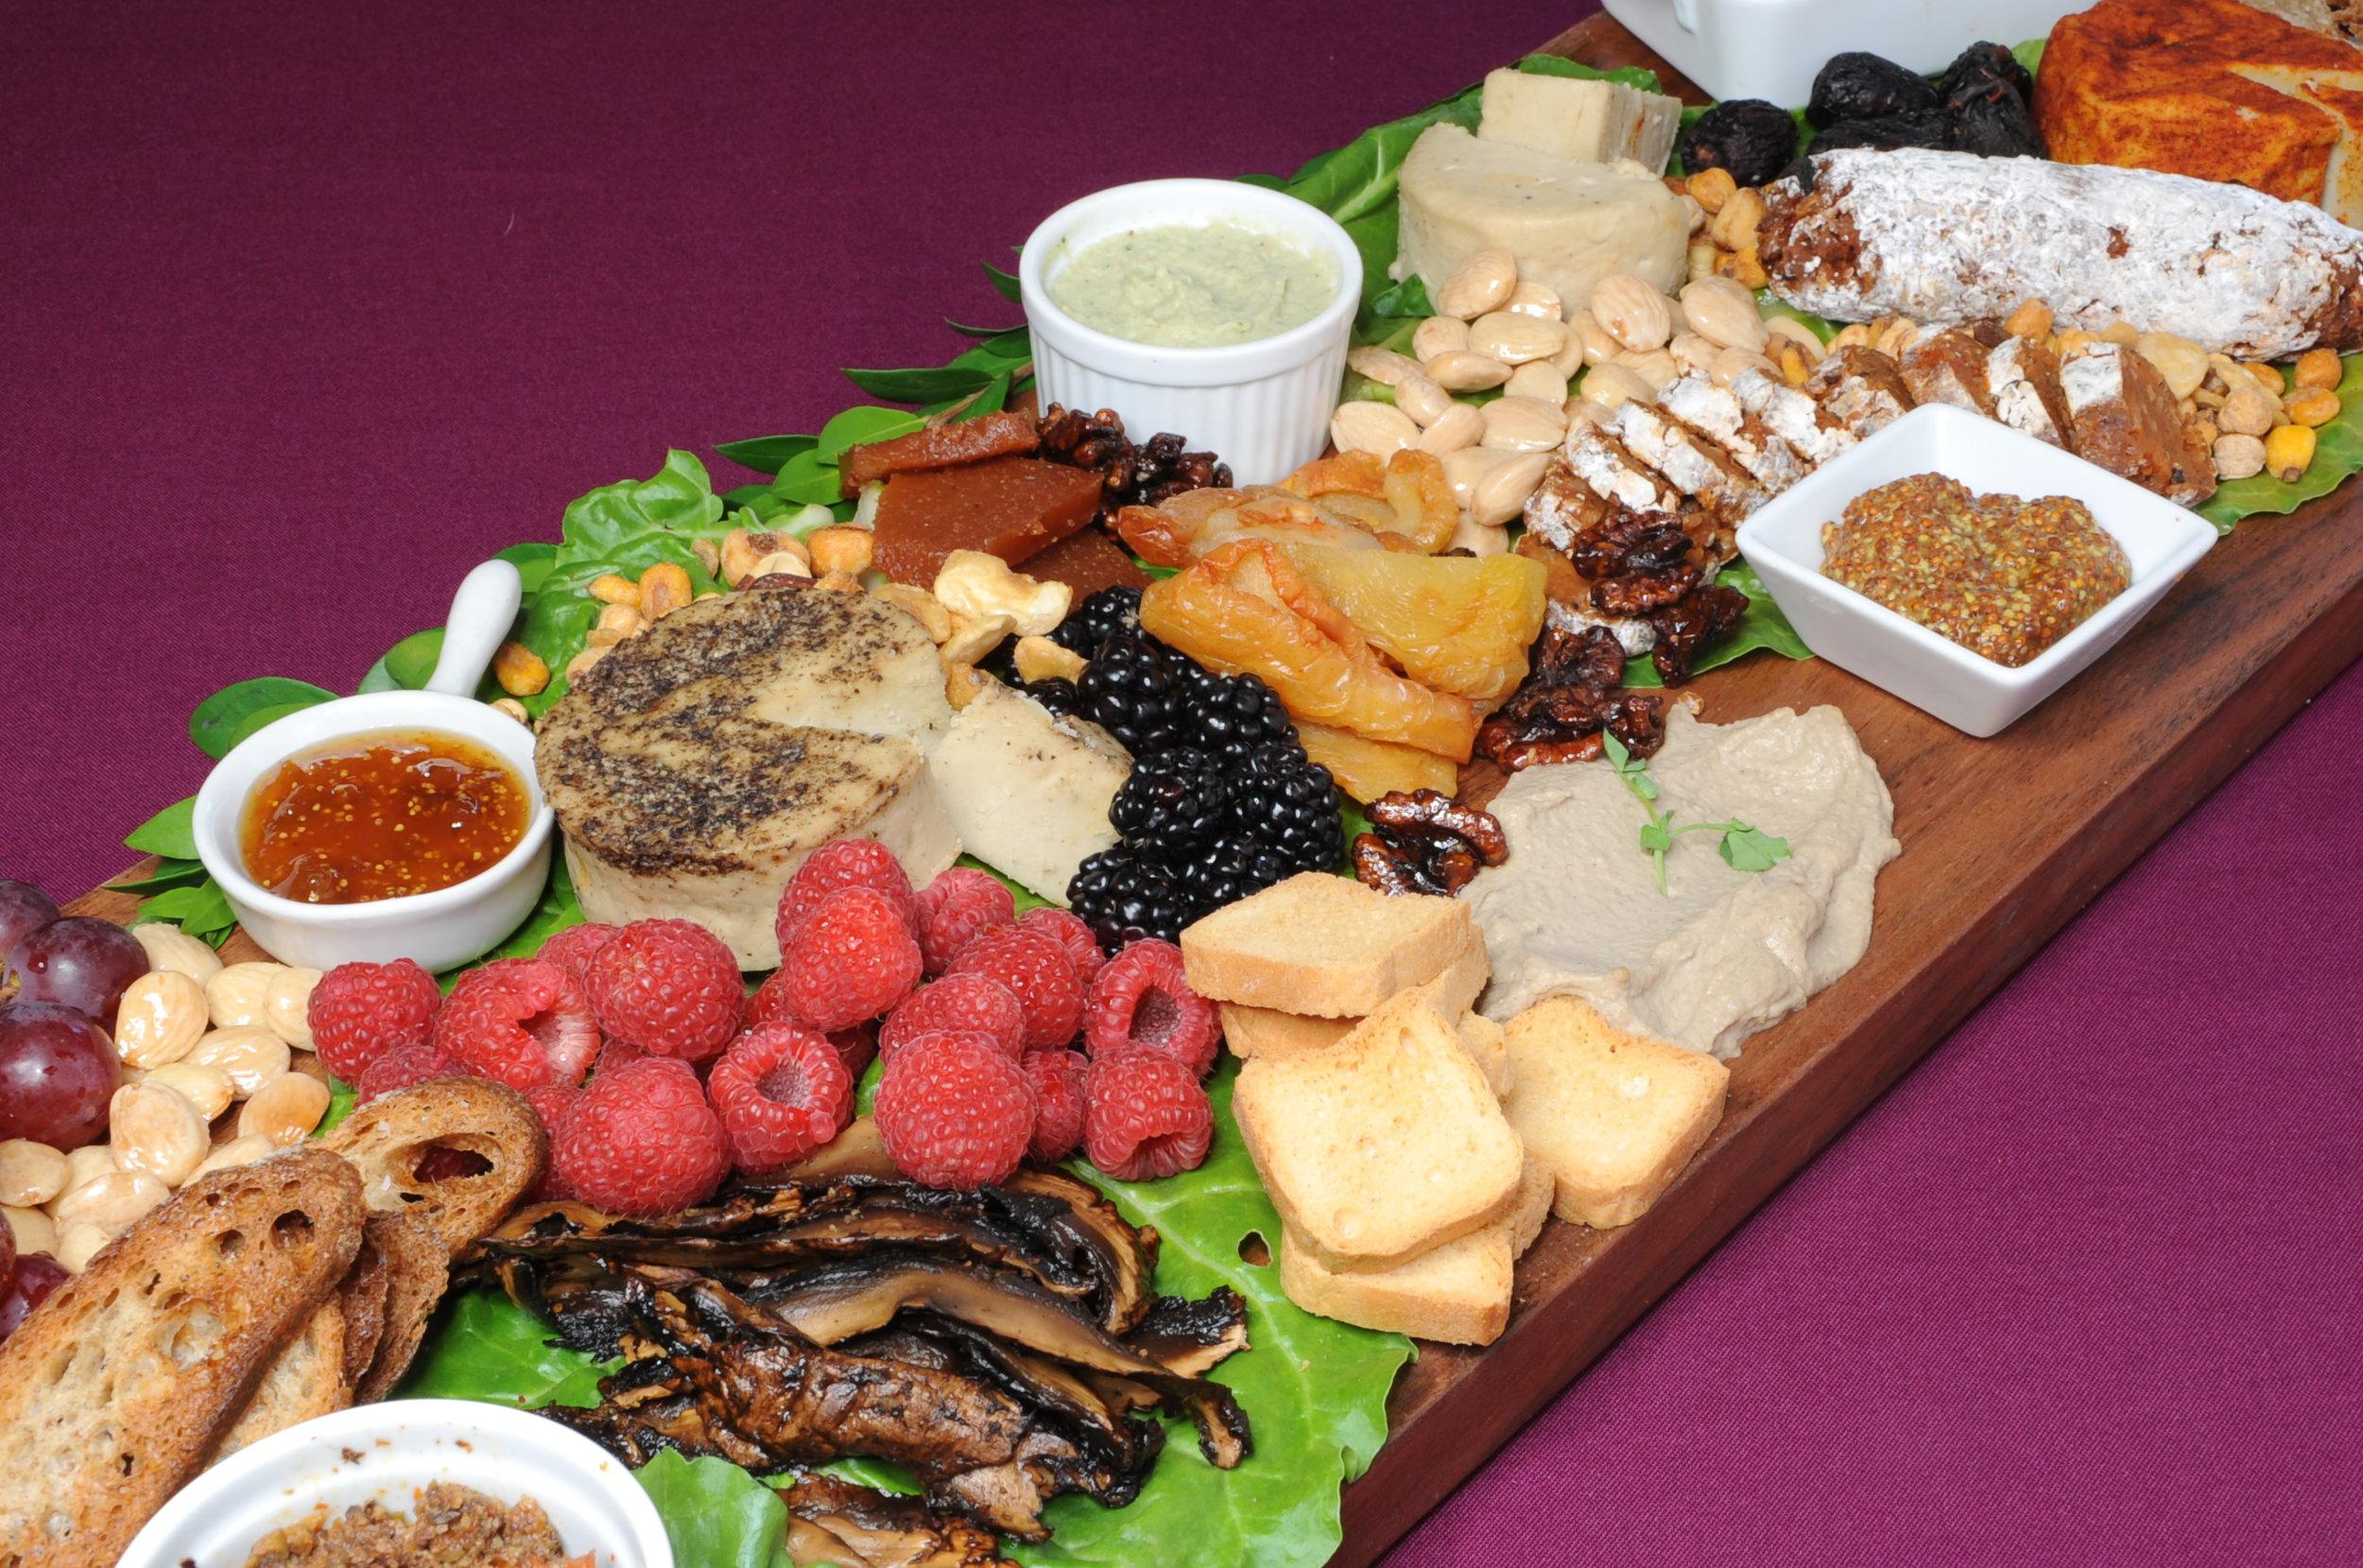 Vegan Charcuterie with Housemade Artisan Cheese